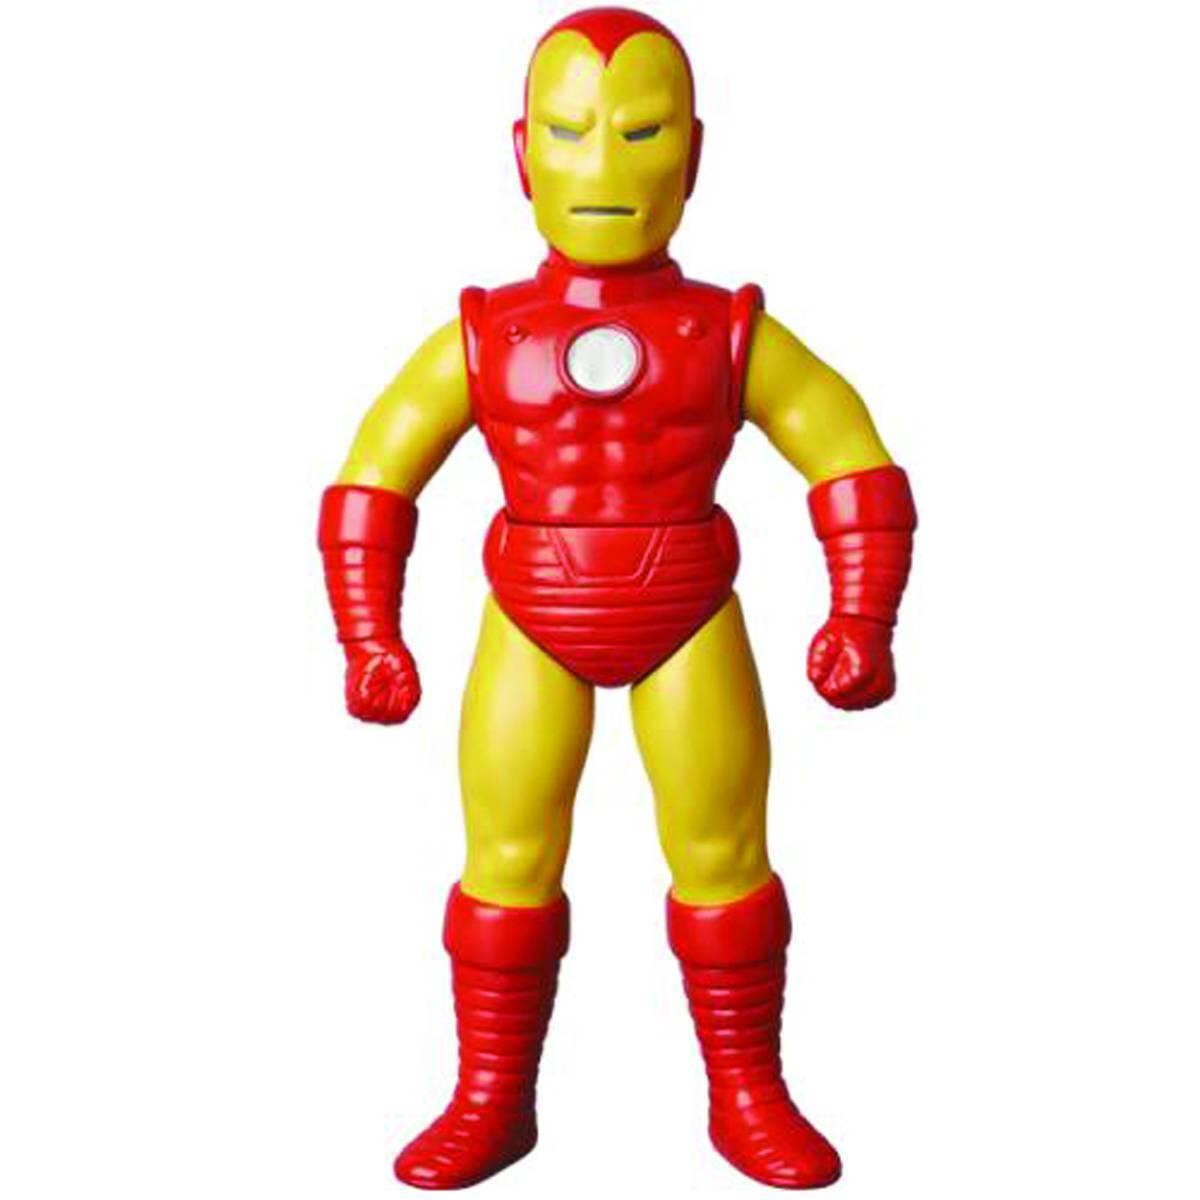 Marvel - iron - man - sofubi px 10 zoll - actionfigur medicom spielzeug - konzern